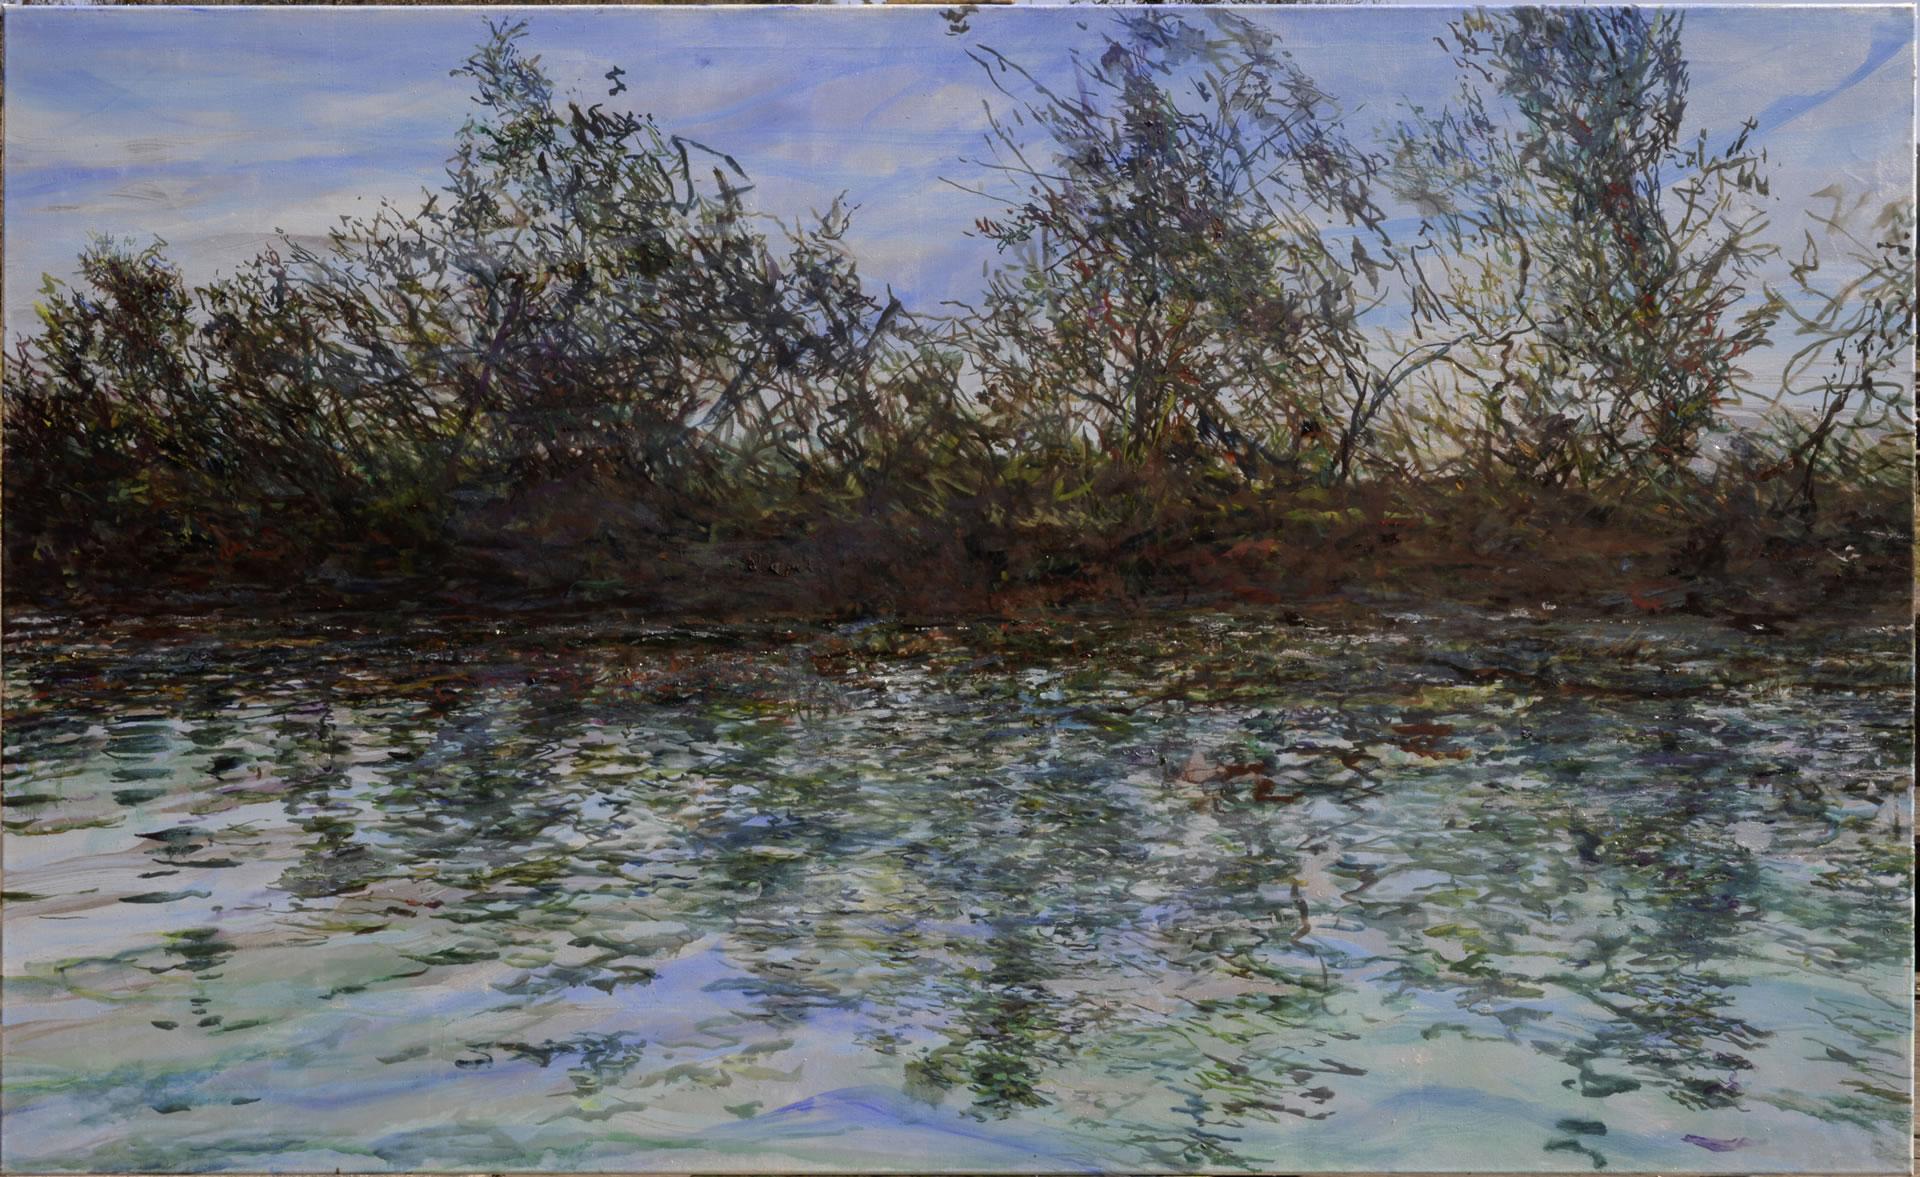 FLUX23 | Markus Orsini-Rosenberg | Lagune bei Grado 2 | 2018 | 110 x 180 cm